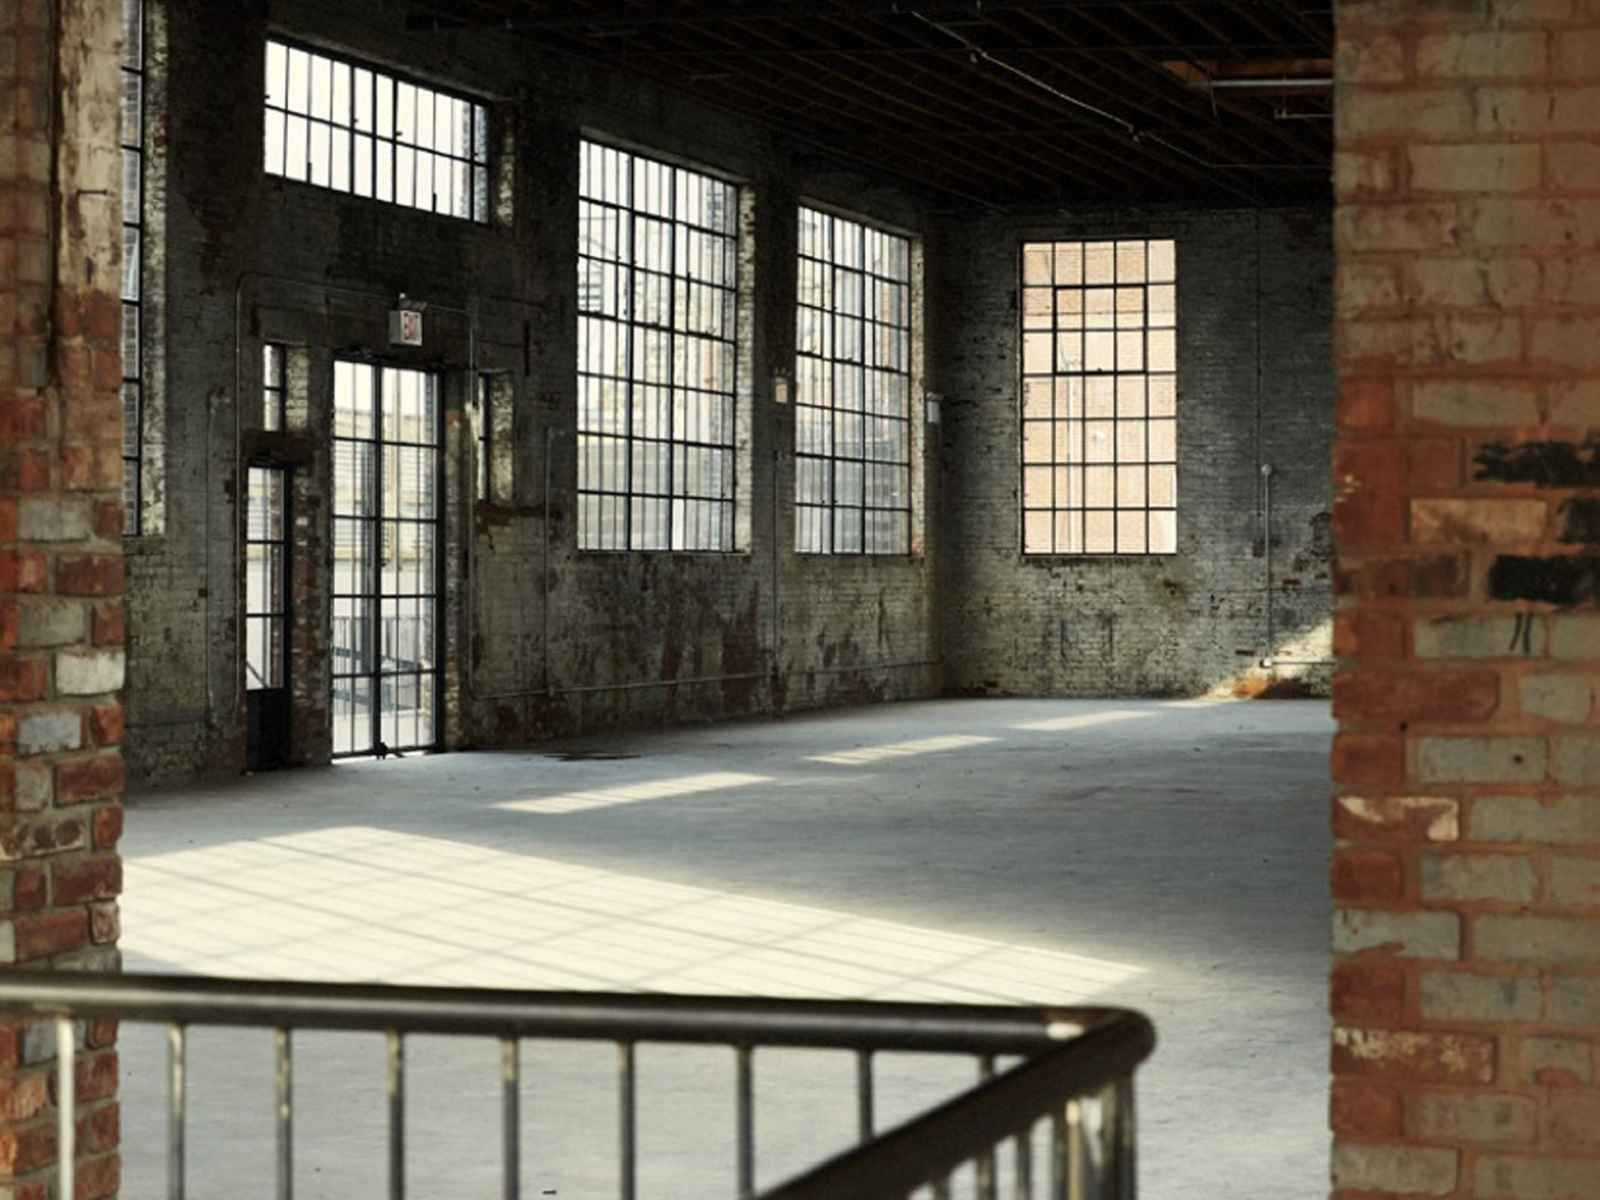 99-scott-slideshow-color-great-room-1600x1200.jpg